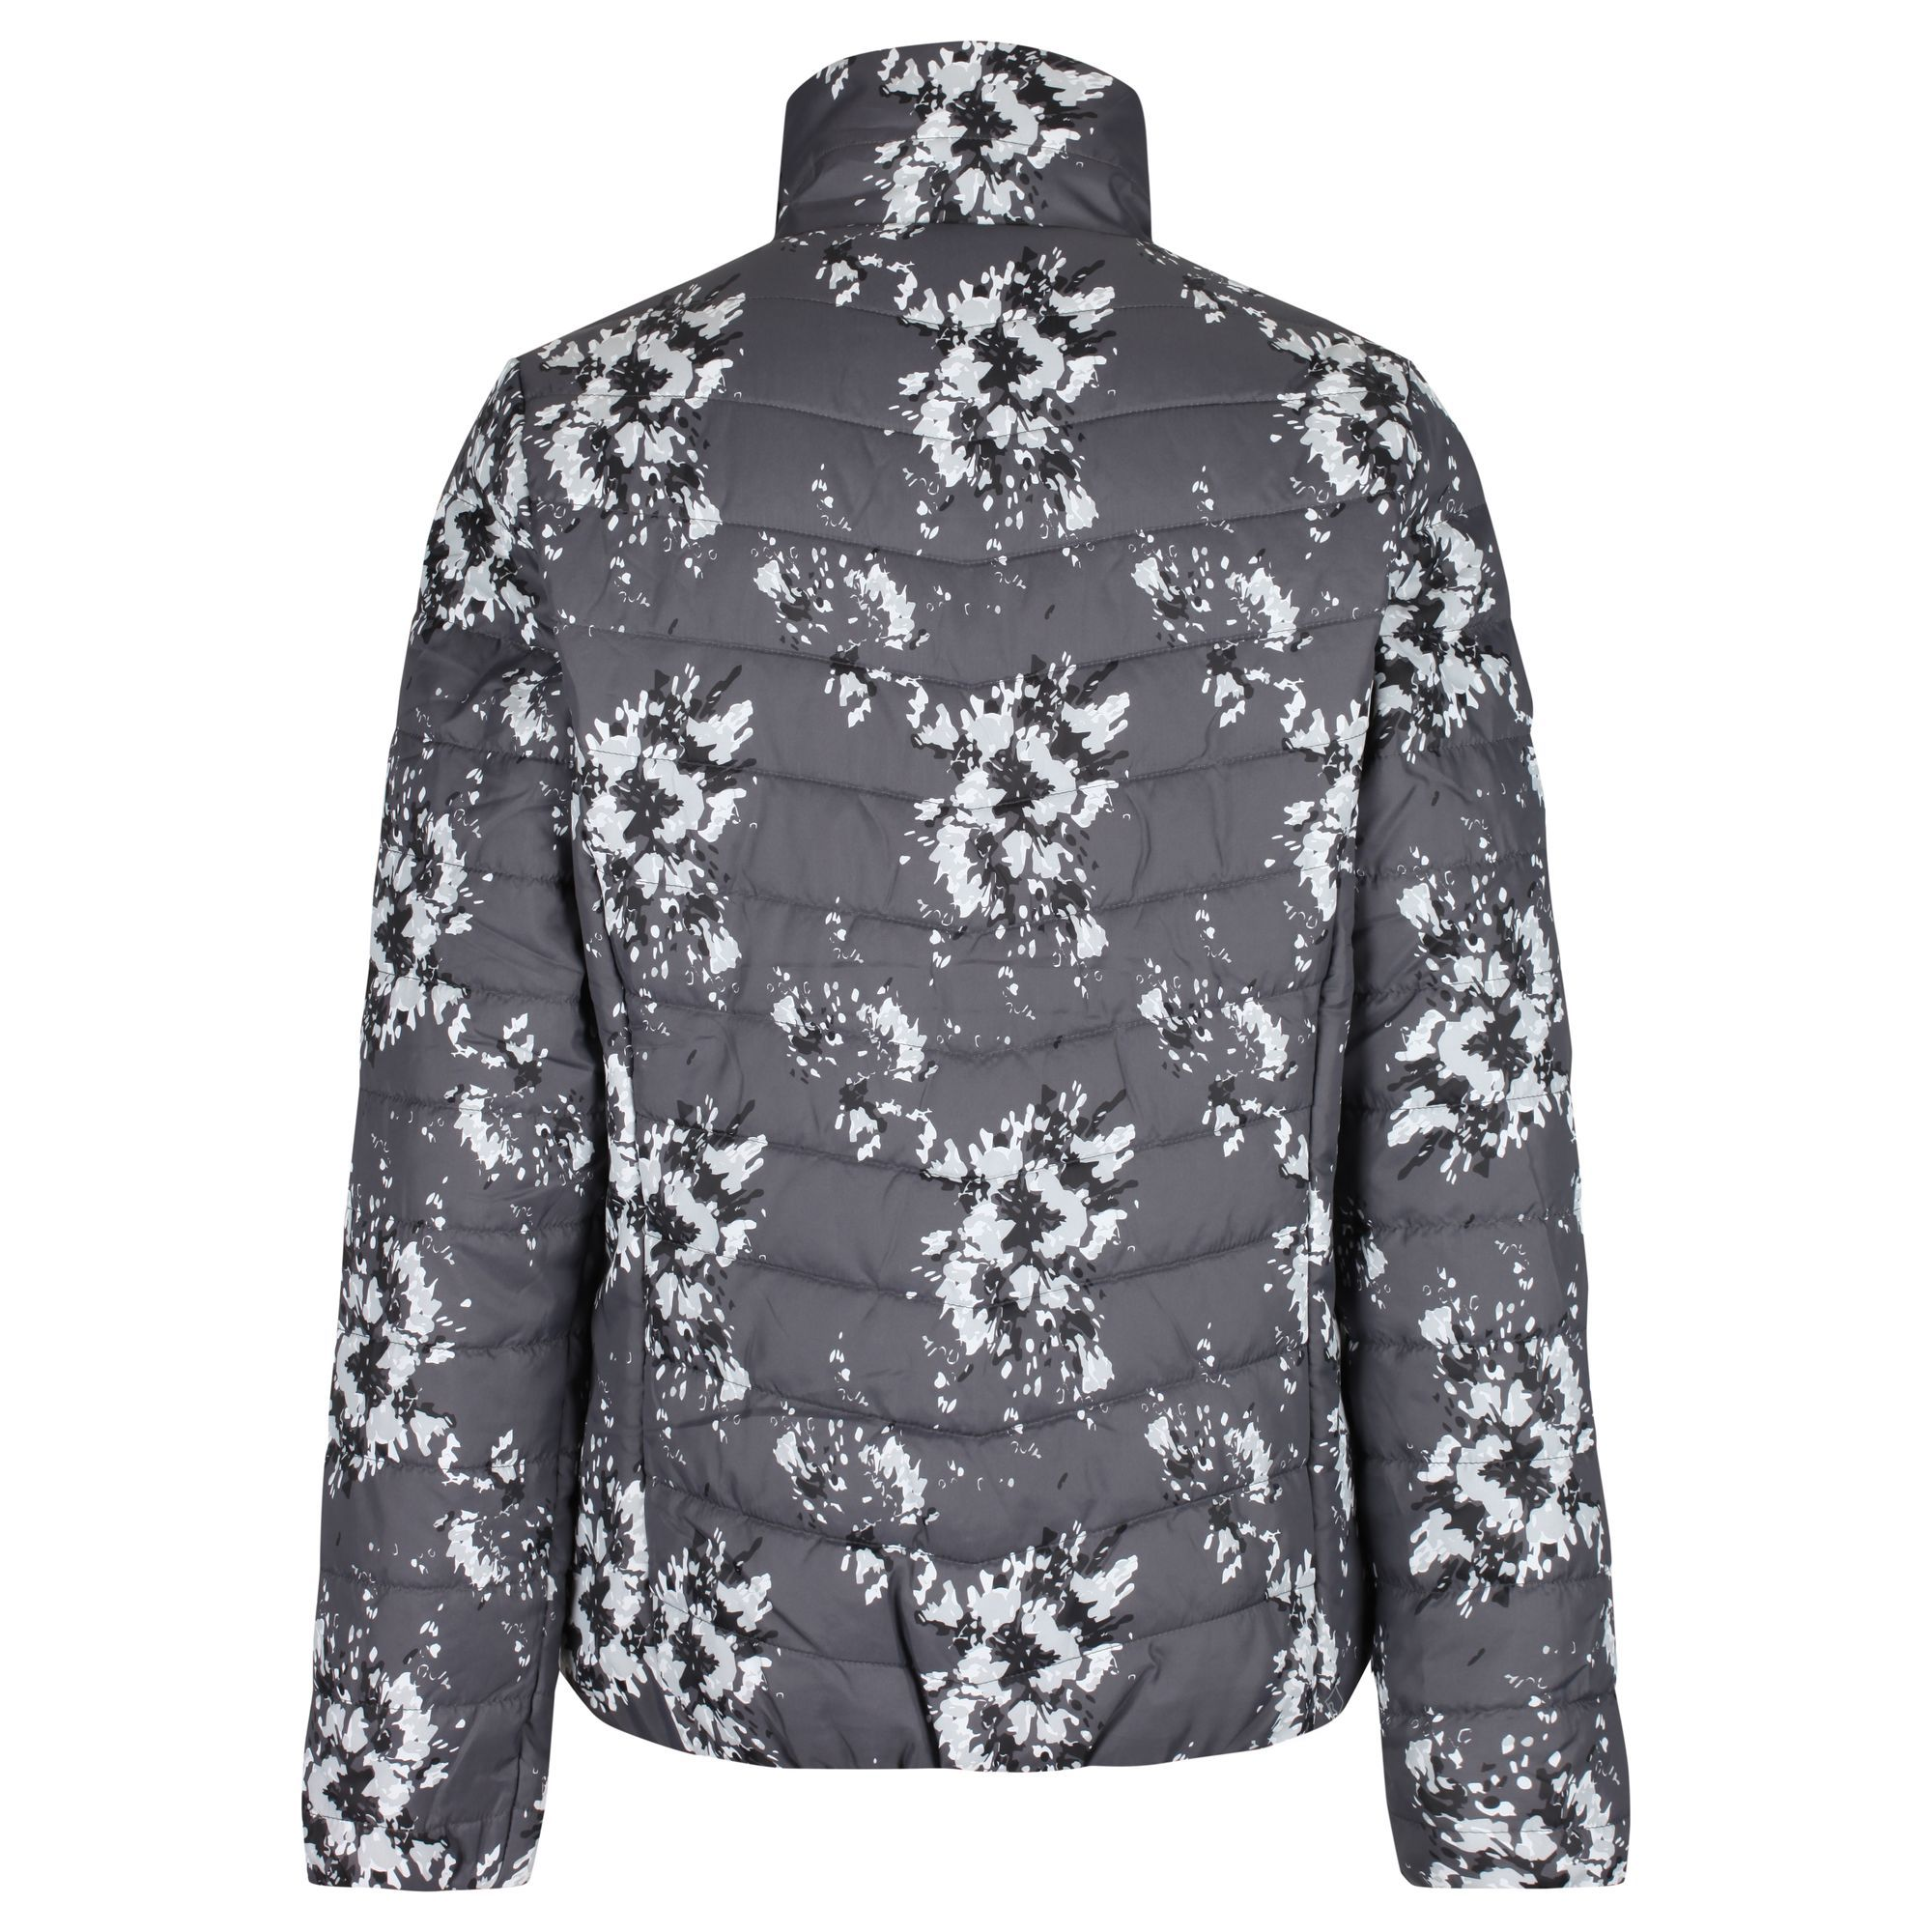 Regatta Womens/Ladies Freezeway Insulated Jacket